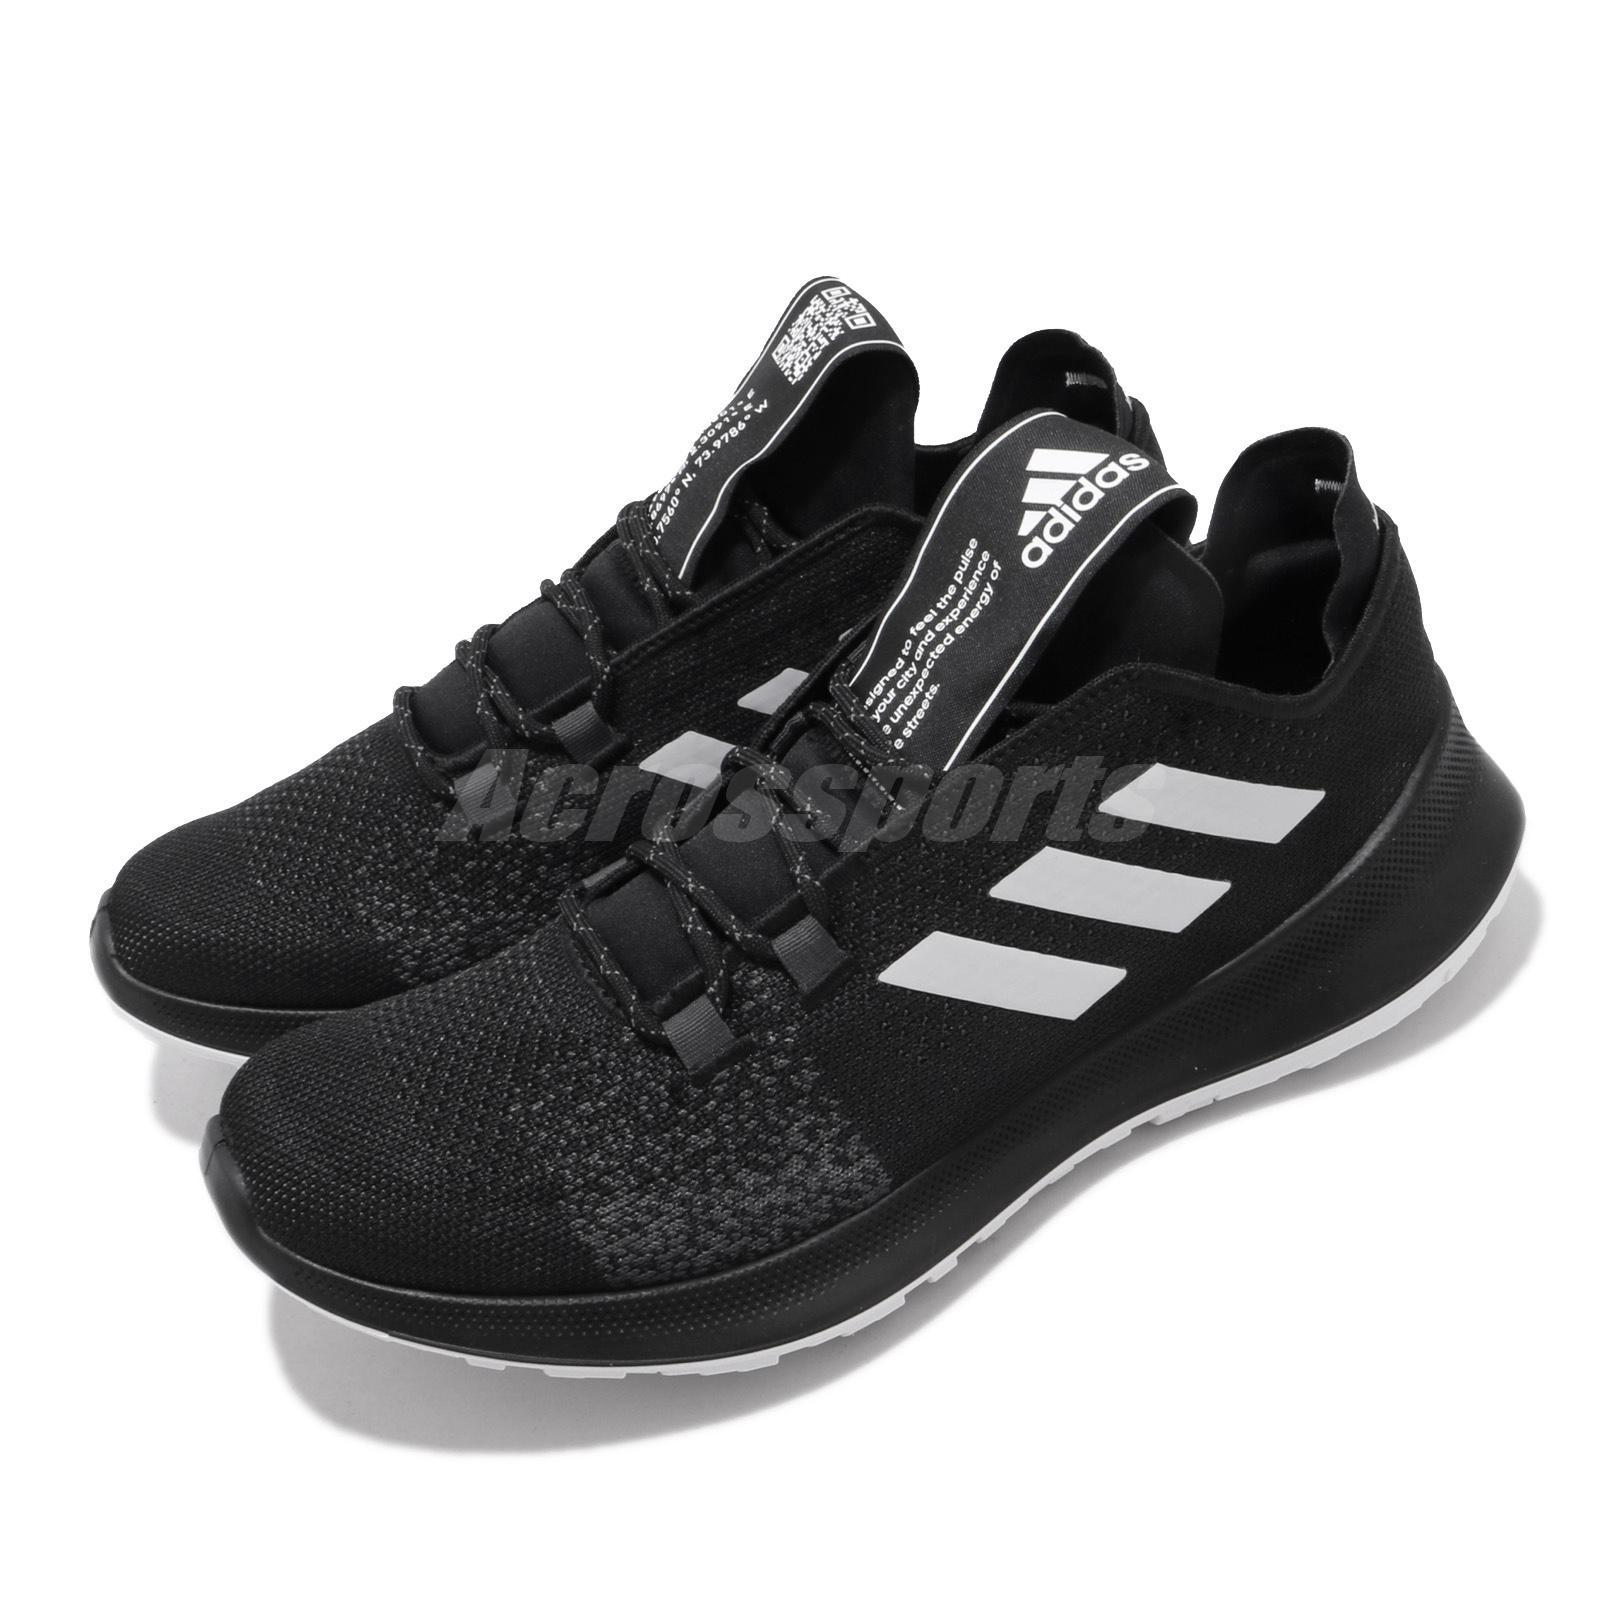 adidas SenseBounce Ace M Black White